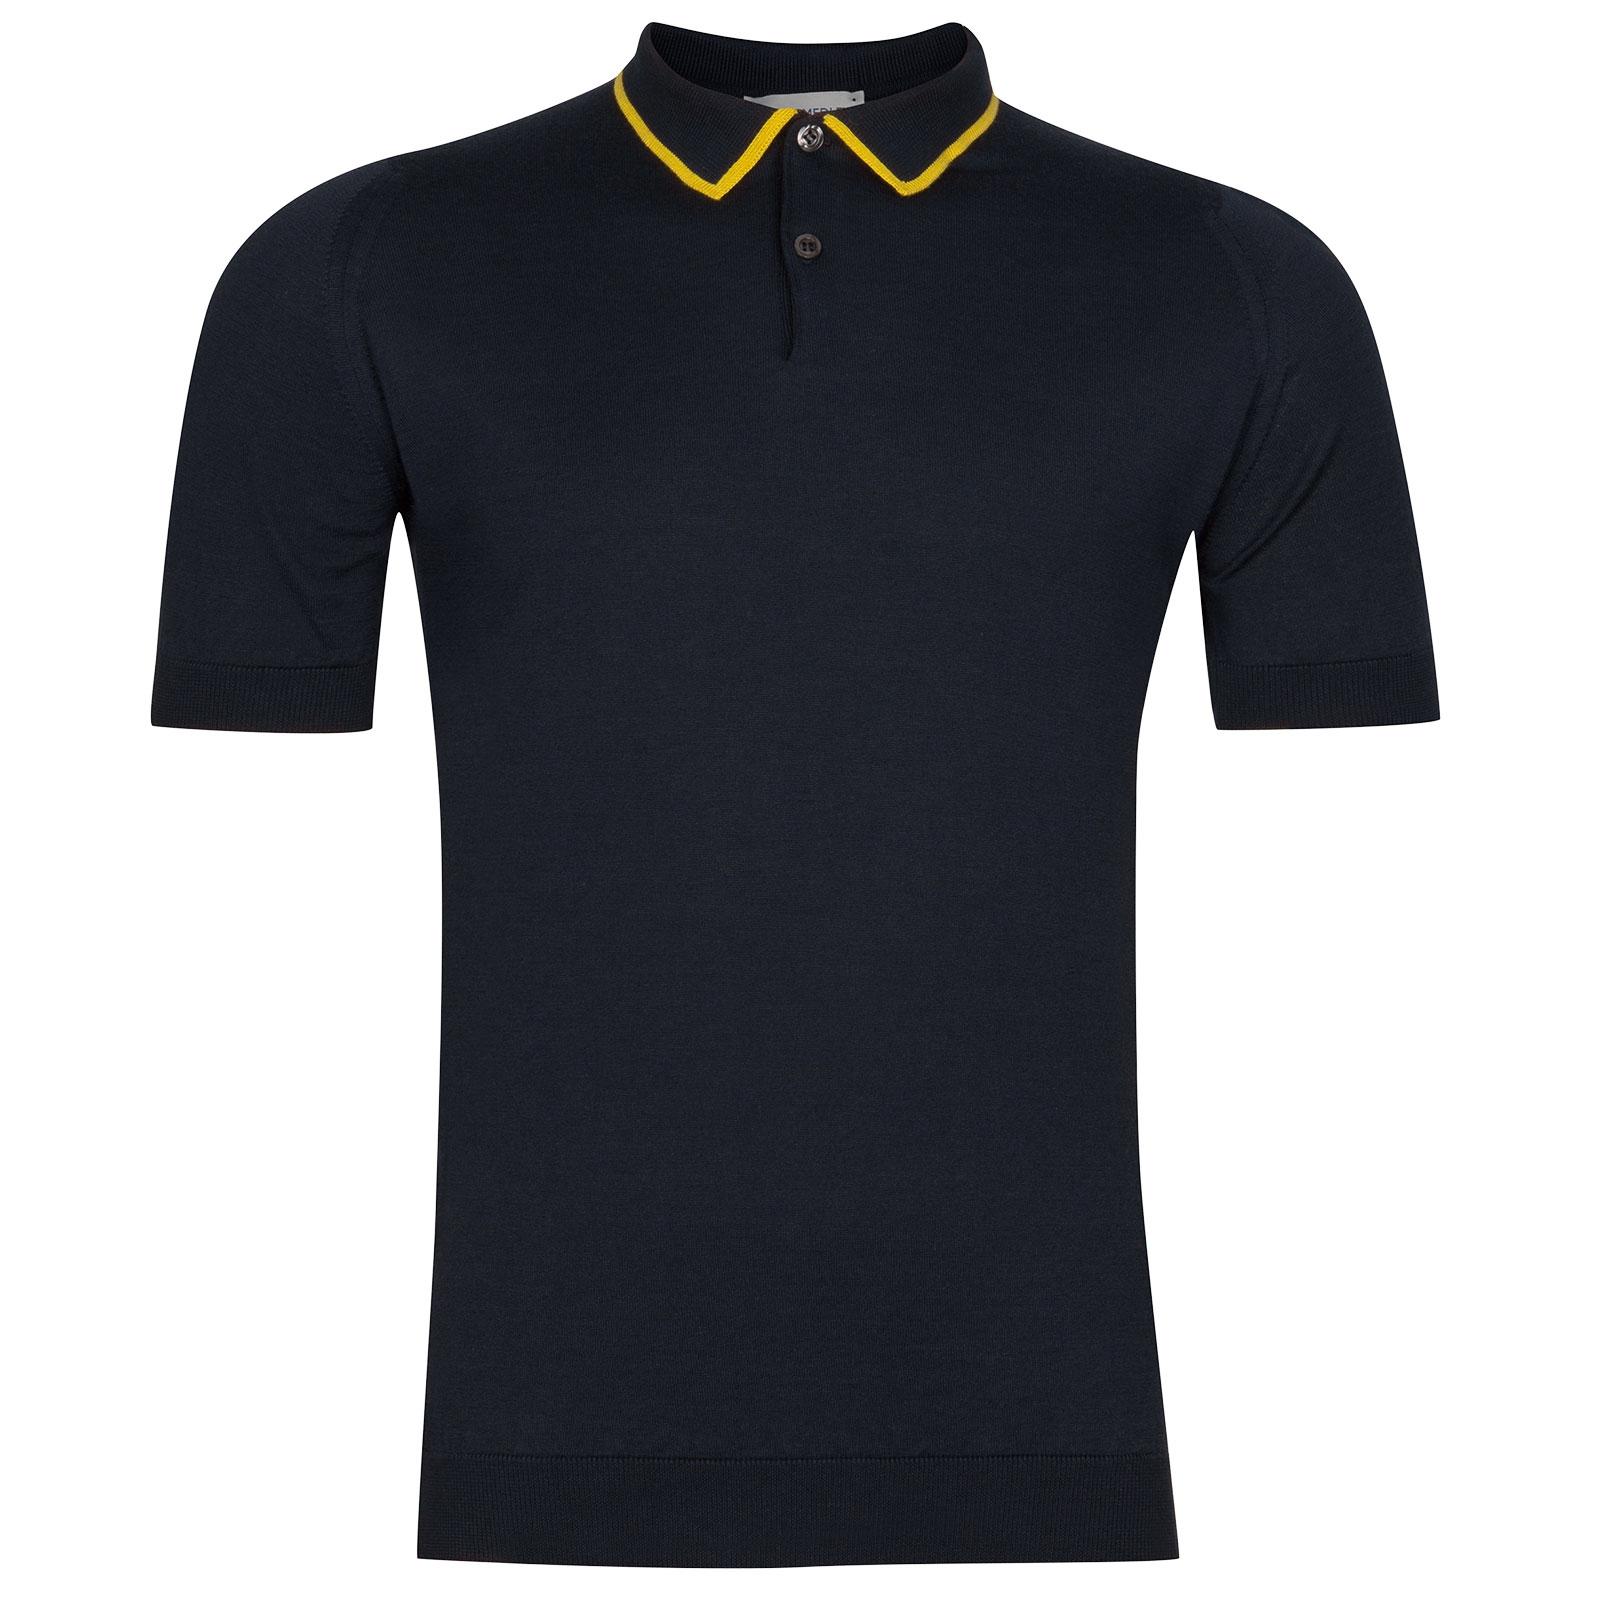 John Smedley Klerk Sea Island Cotton Shirt in Navy-XXL